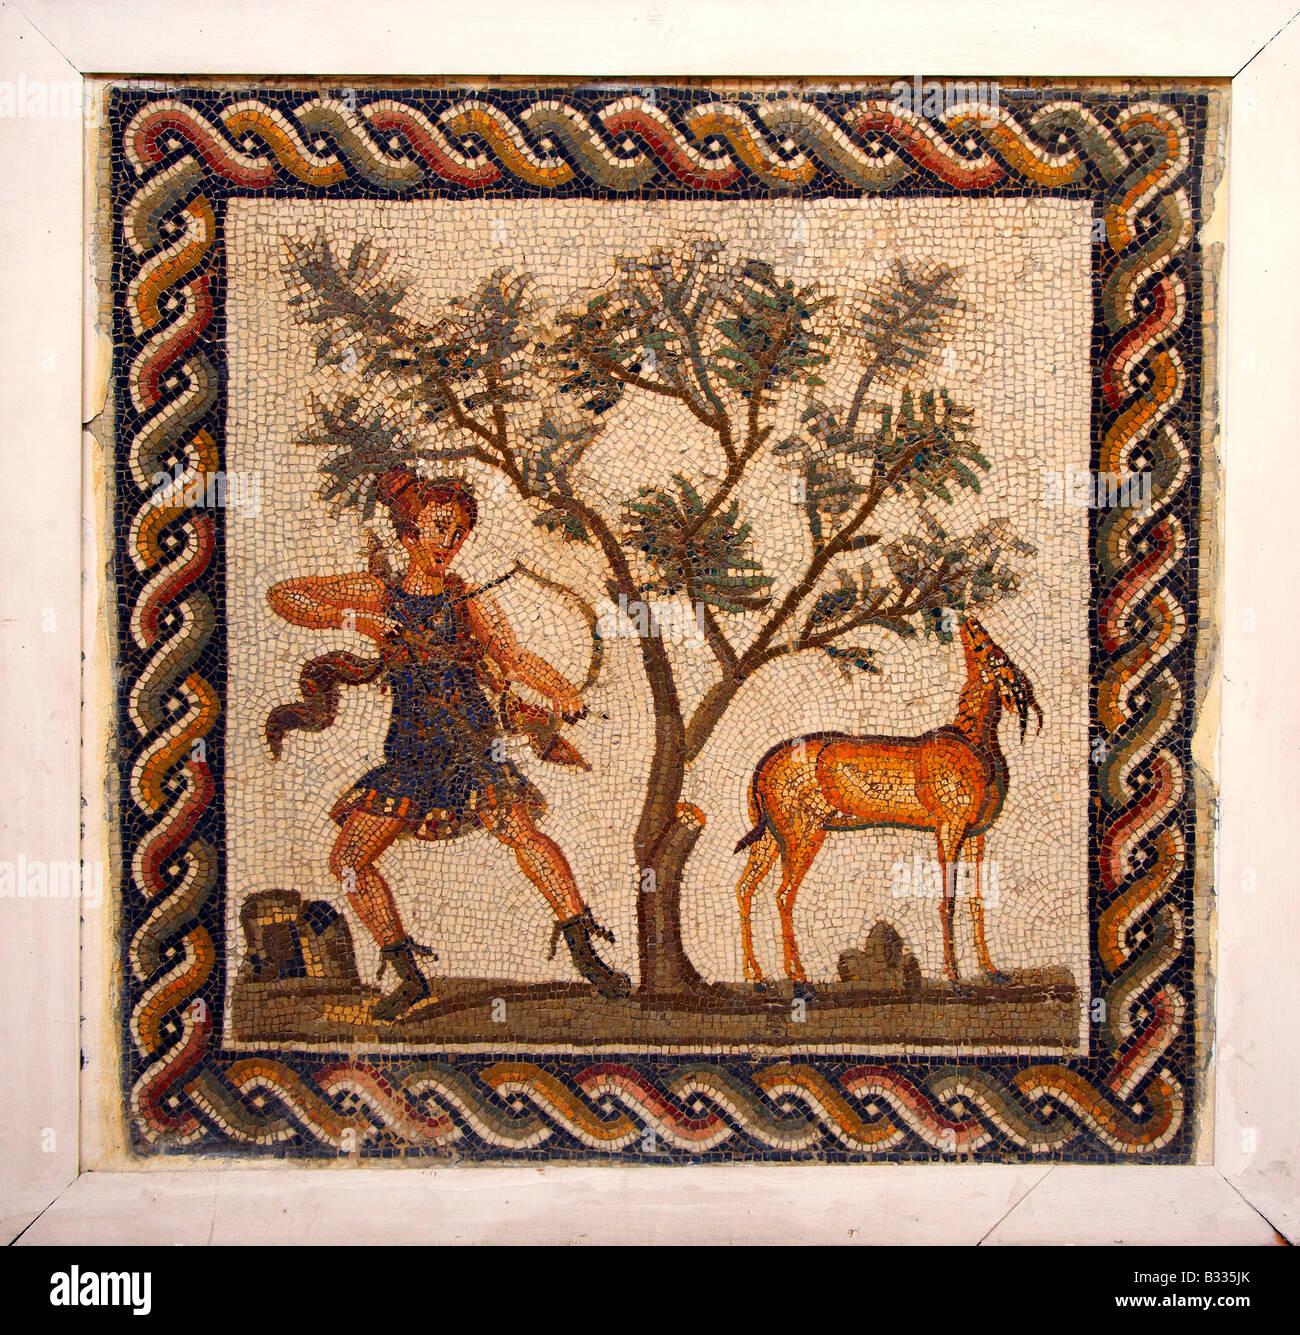 Mosaic in the Bardo Museum, Tunis, Tunisia, North Africa Stock Photo